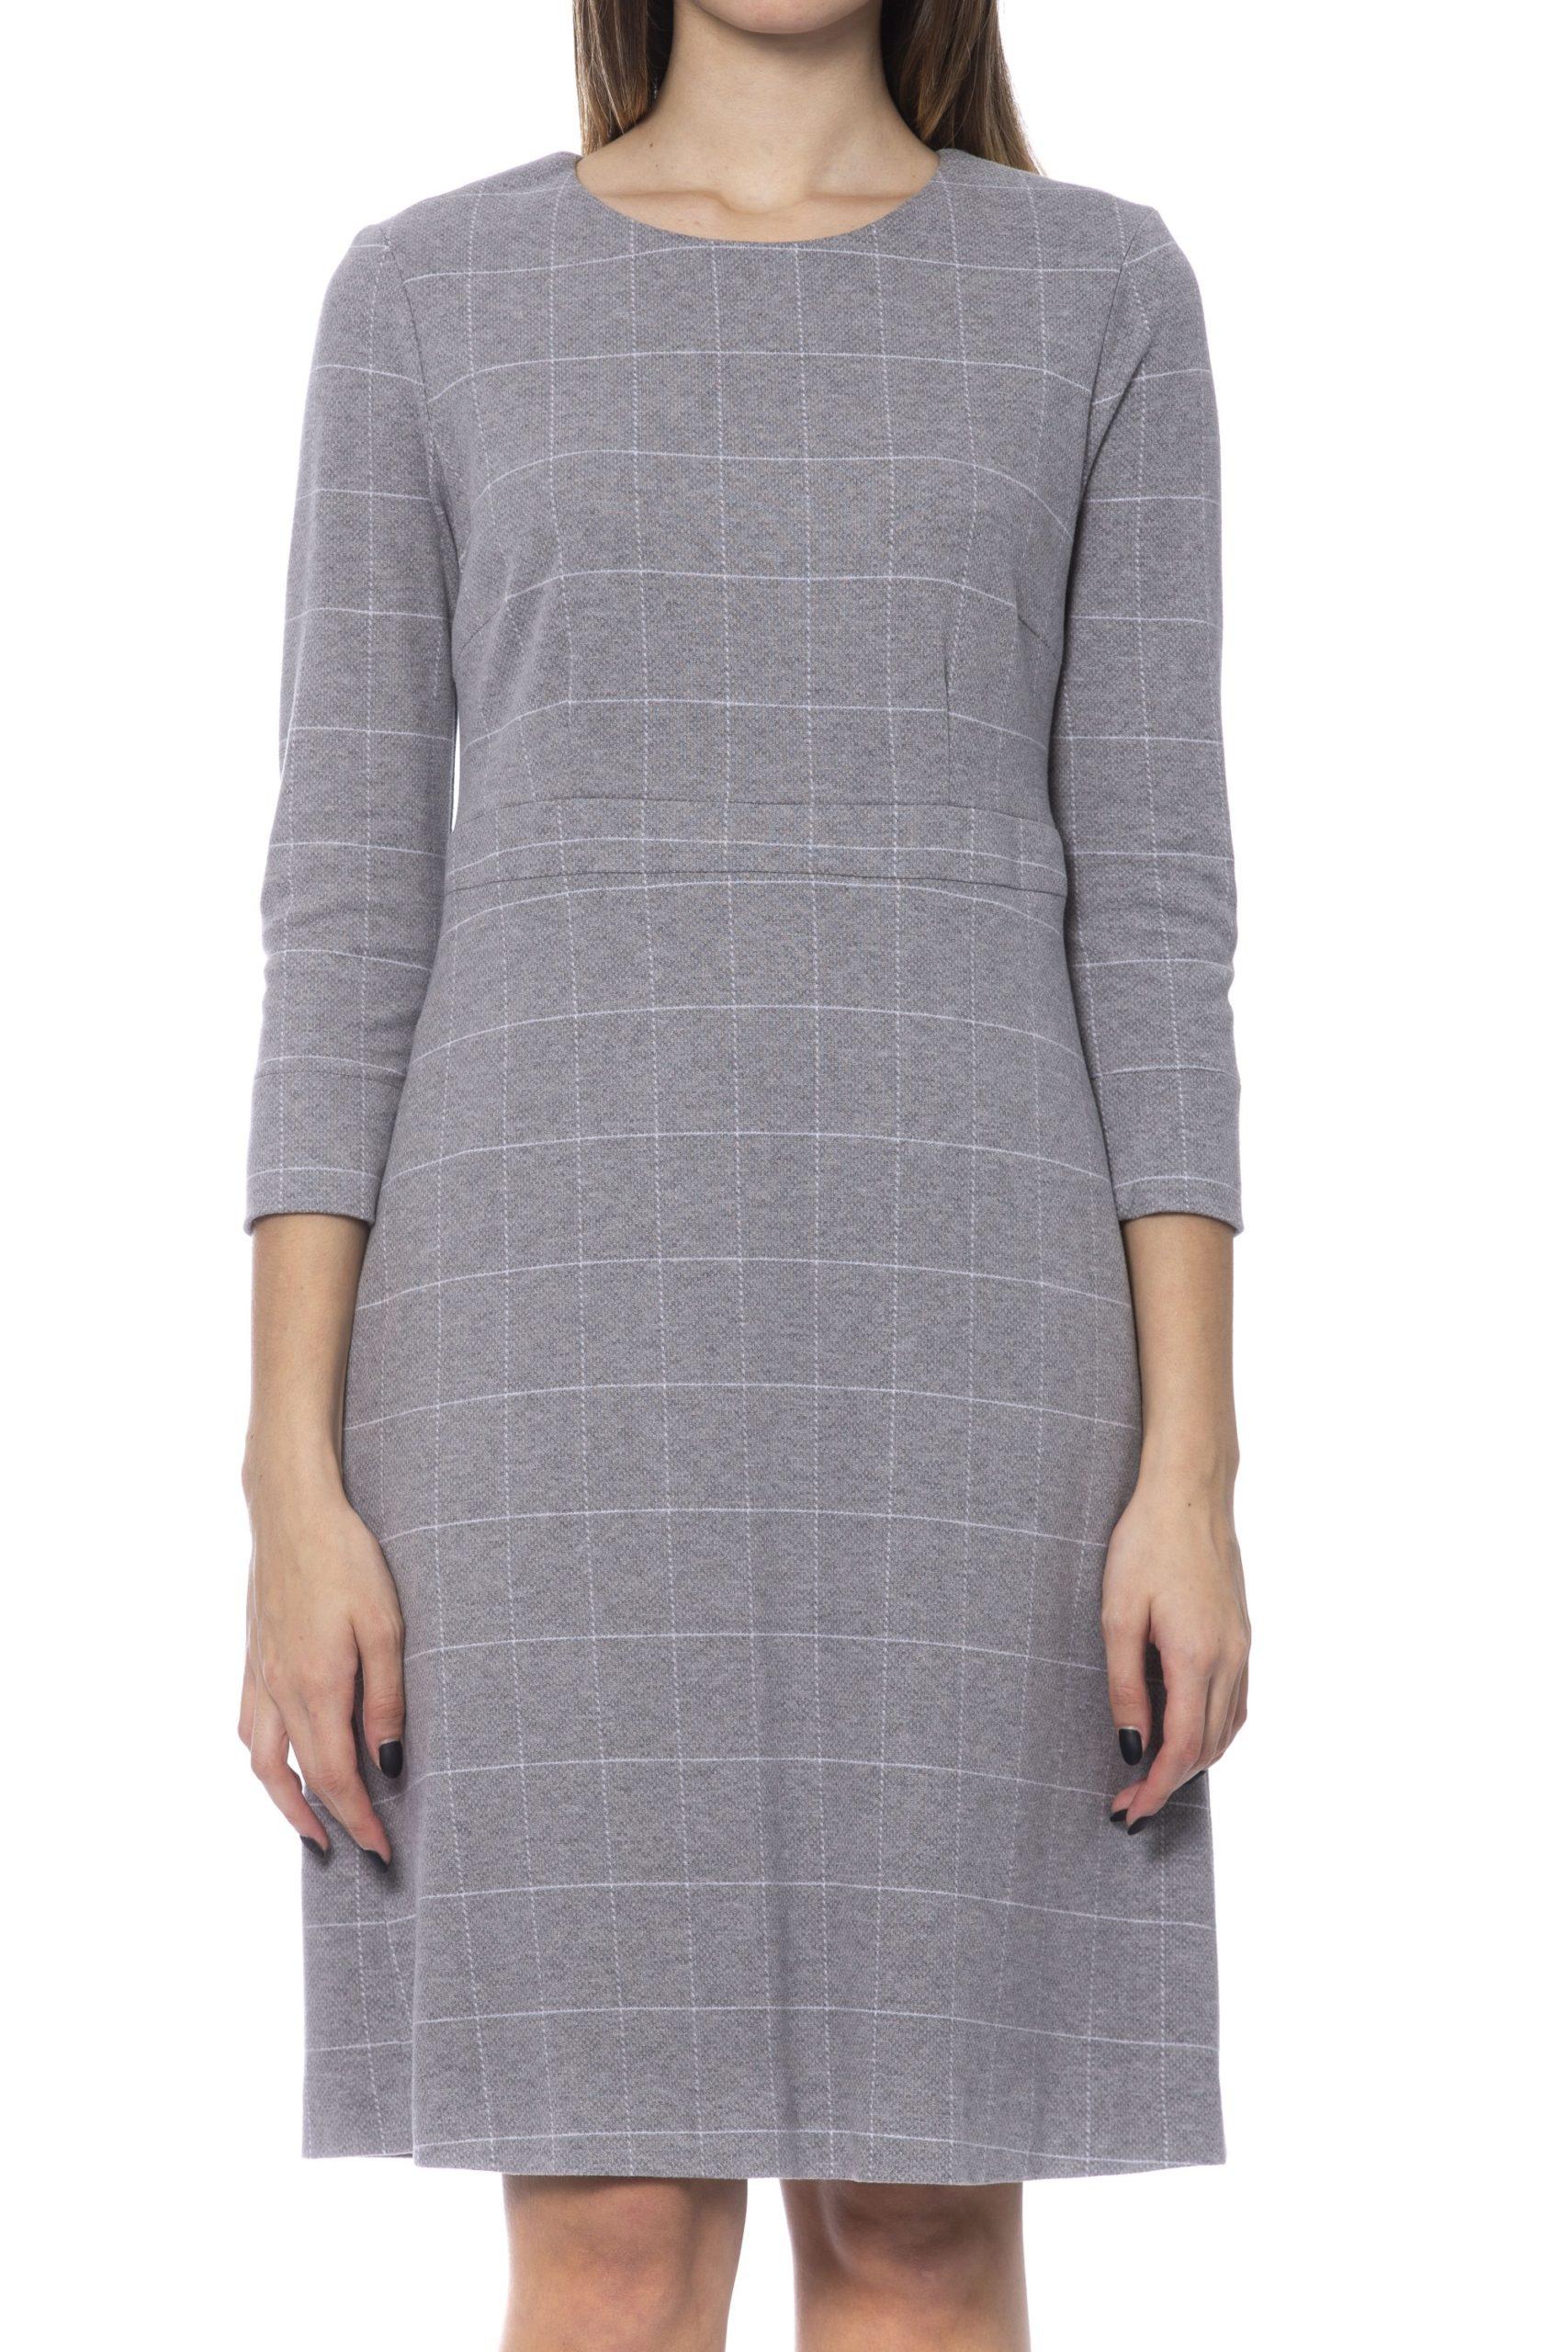 Peserico Women's Dress Grey PE992140 - IT42   S